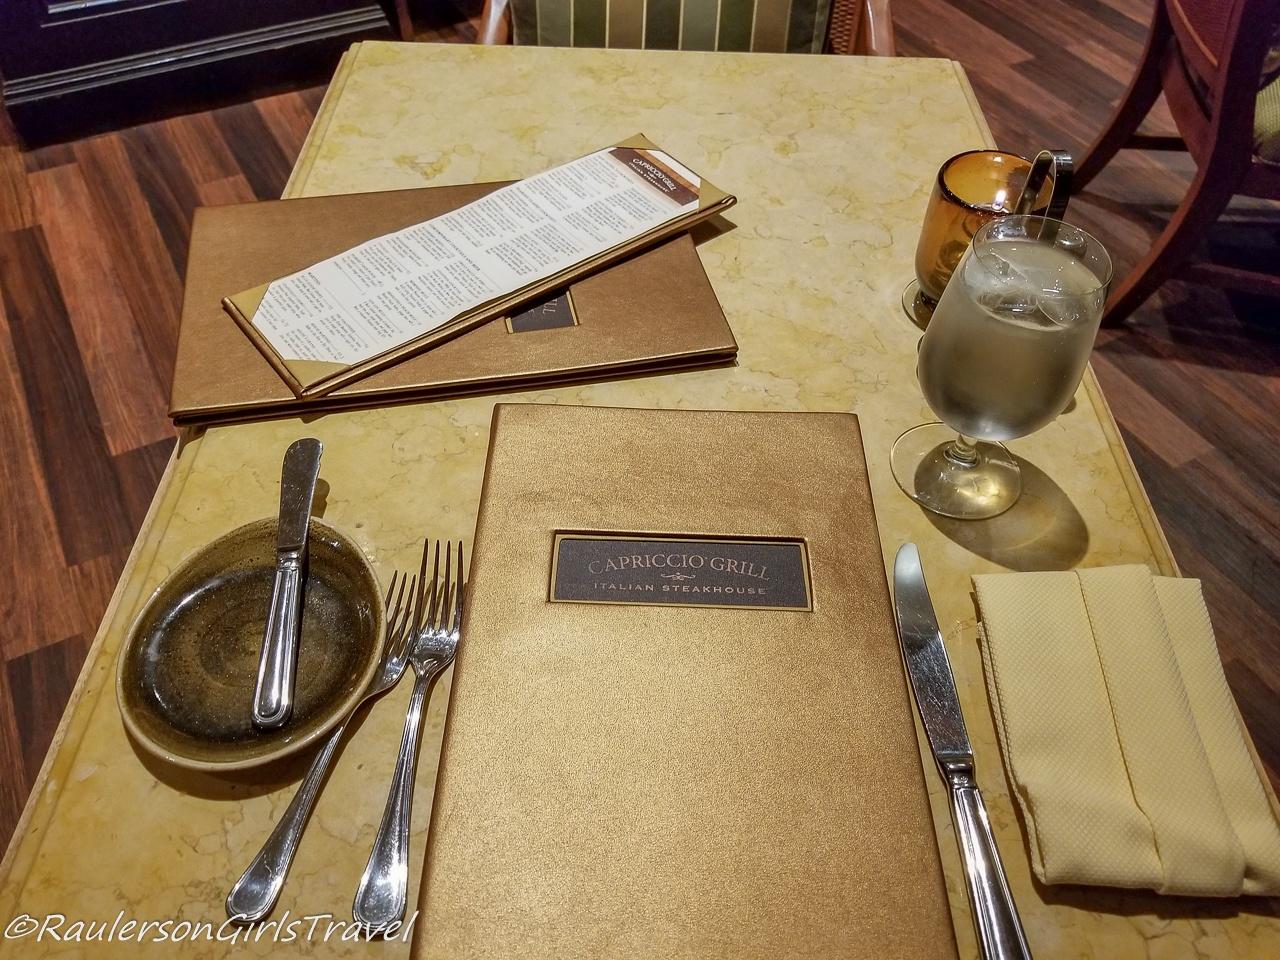 Capriccio Grill Table Setting - Memphis Restaurants